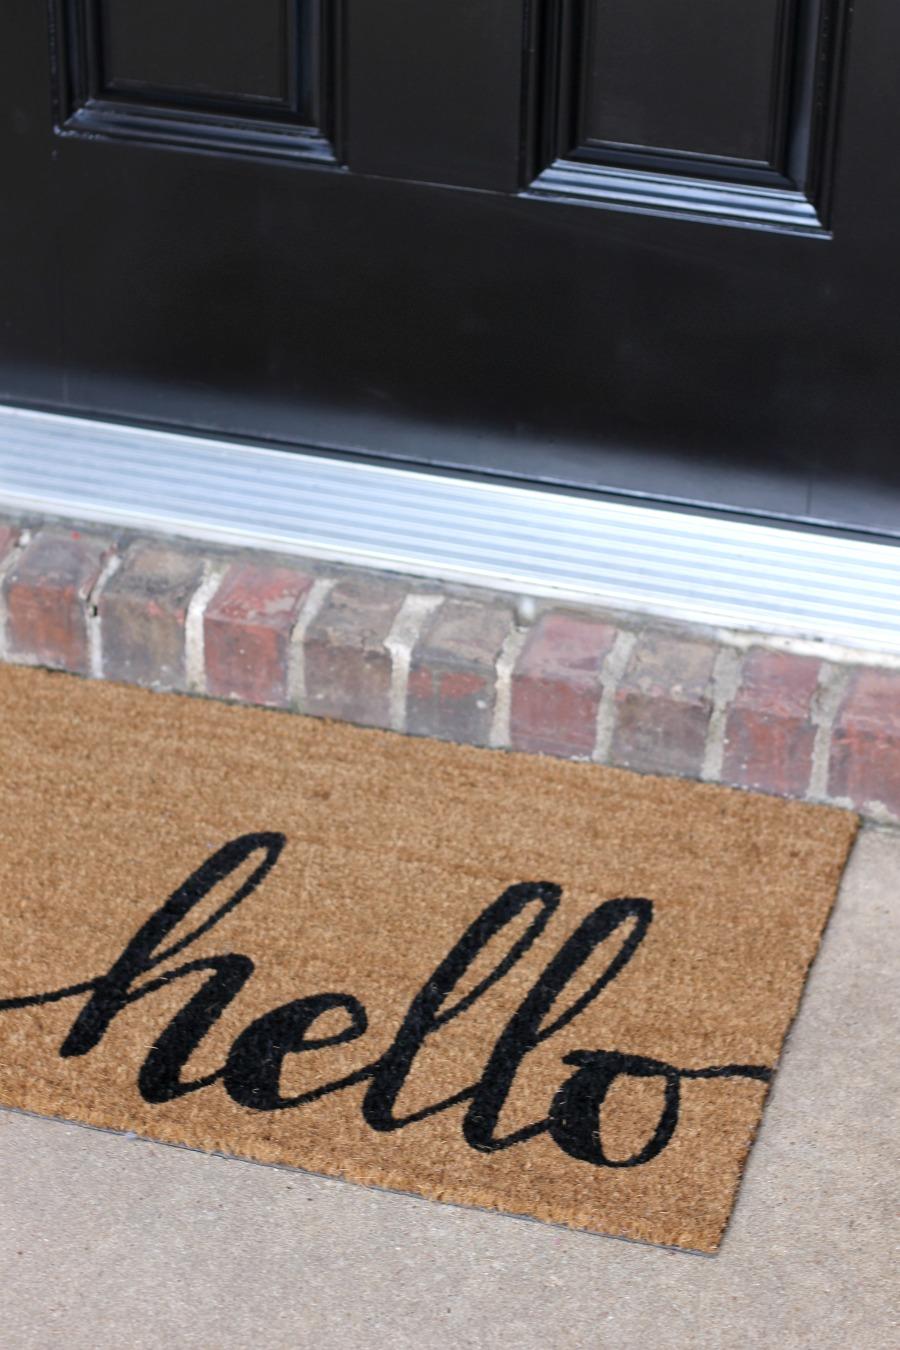 Curb Appeal Ideas - Buy a Fresh Doormat